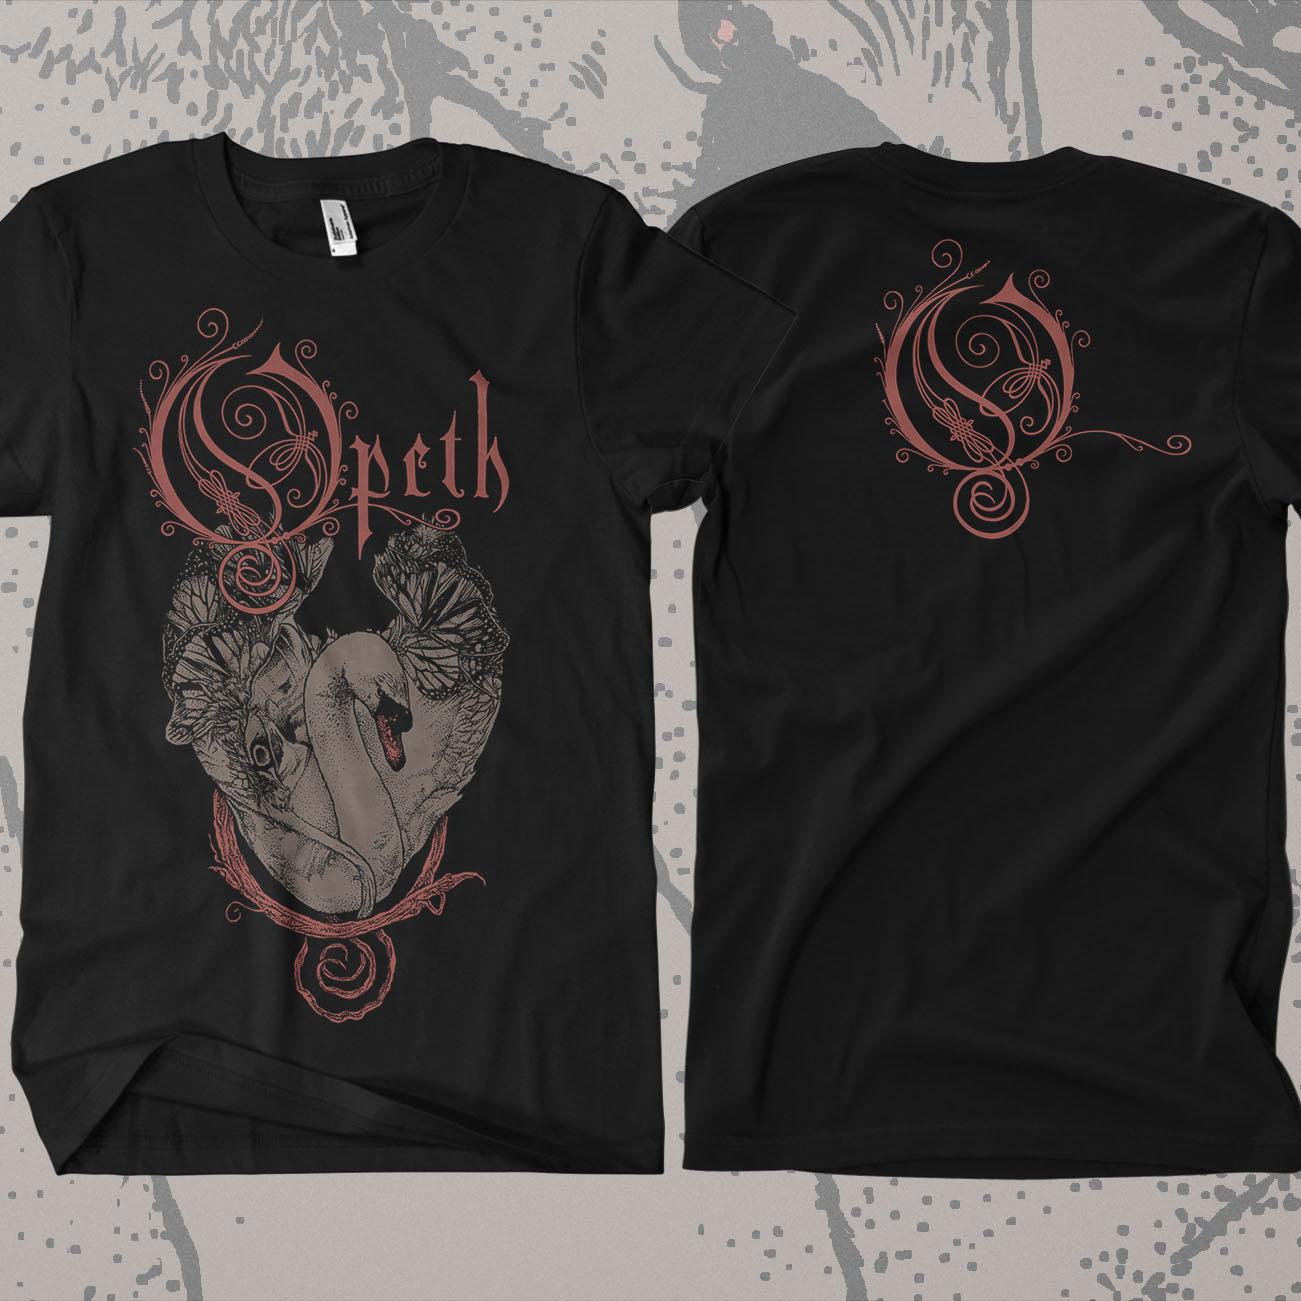 Opeth - 'Swan' T-Shirt - Opeth